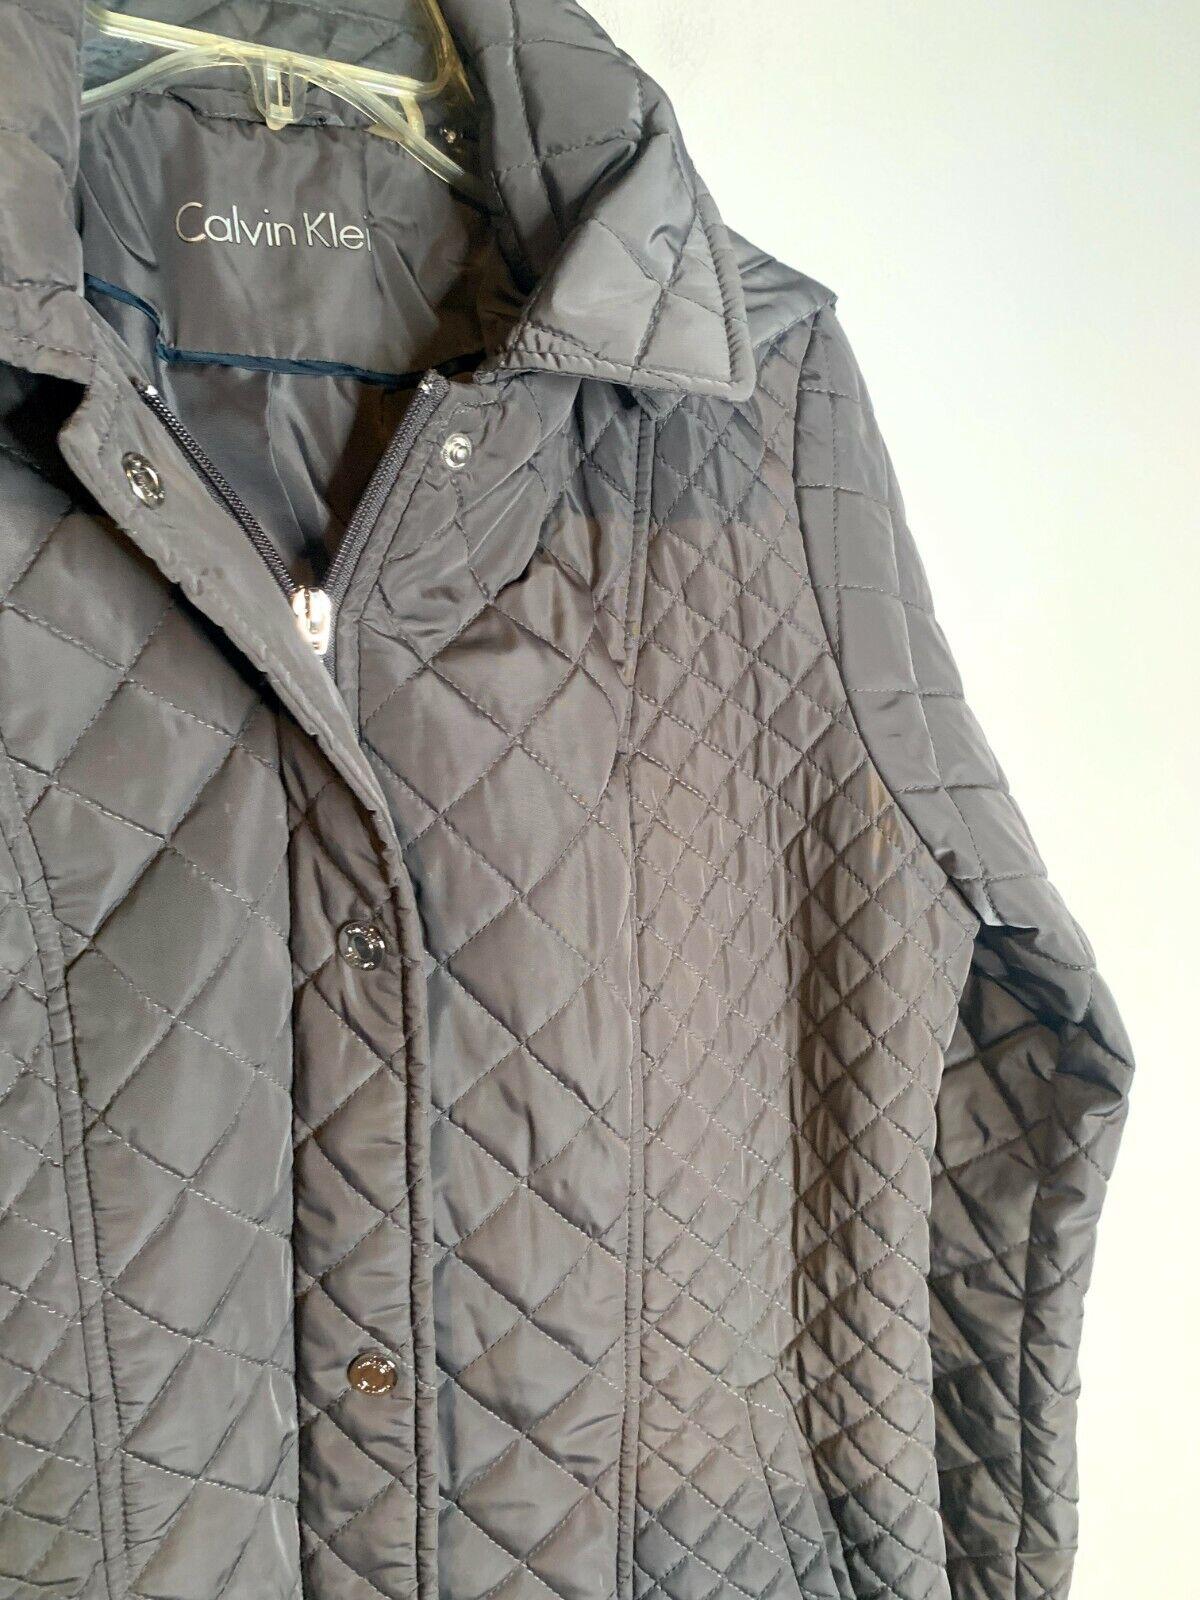 Calvin Klein grey quilted jacket - image 2